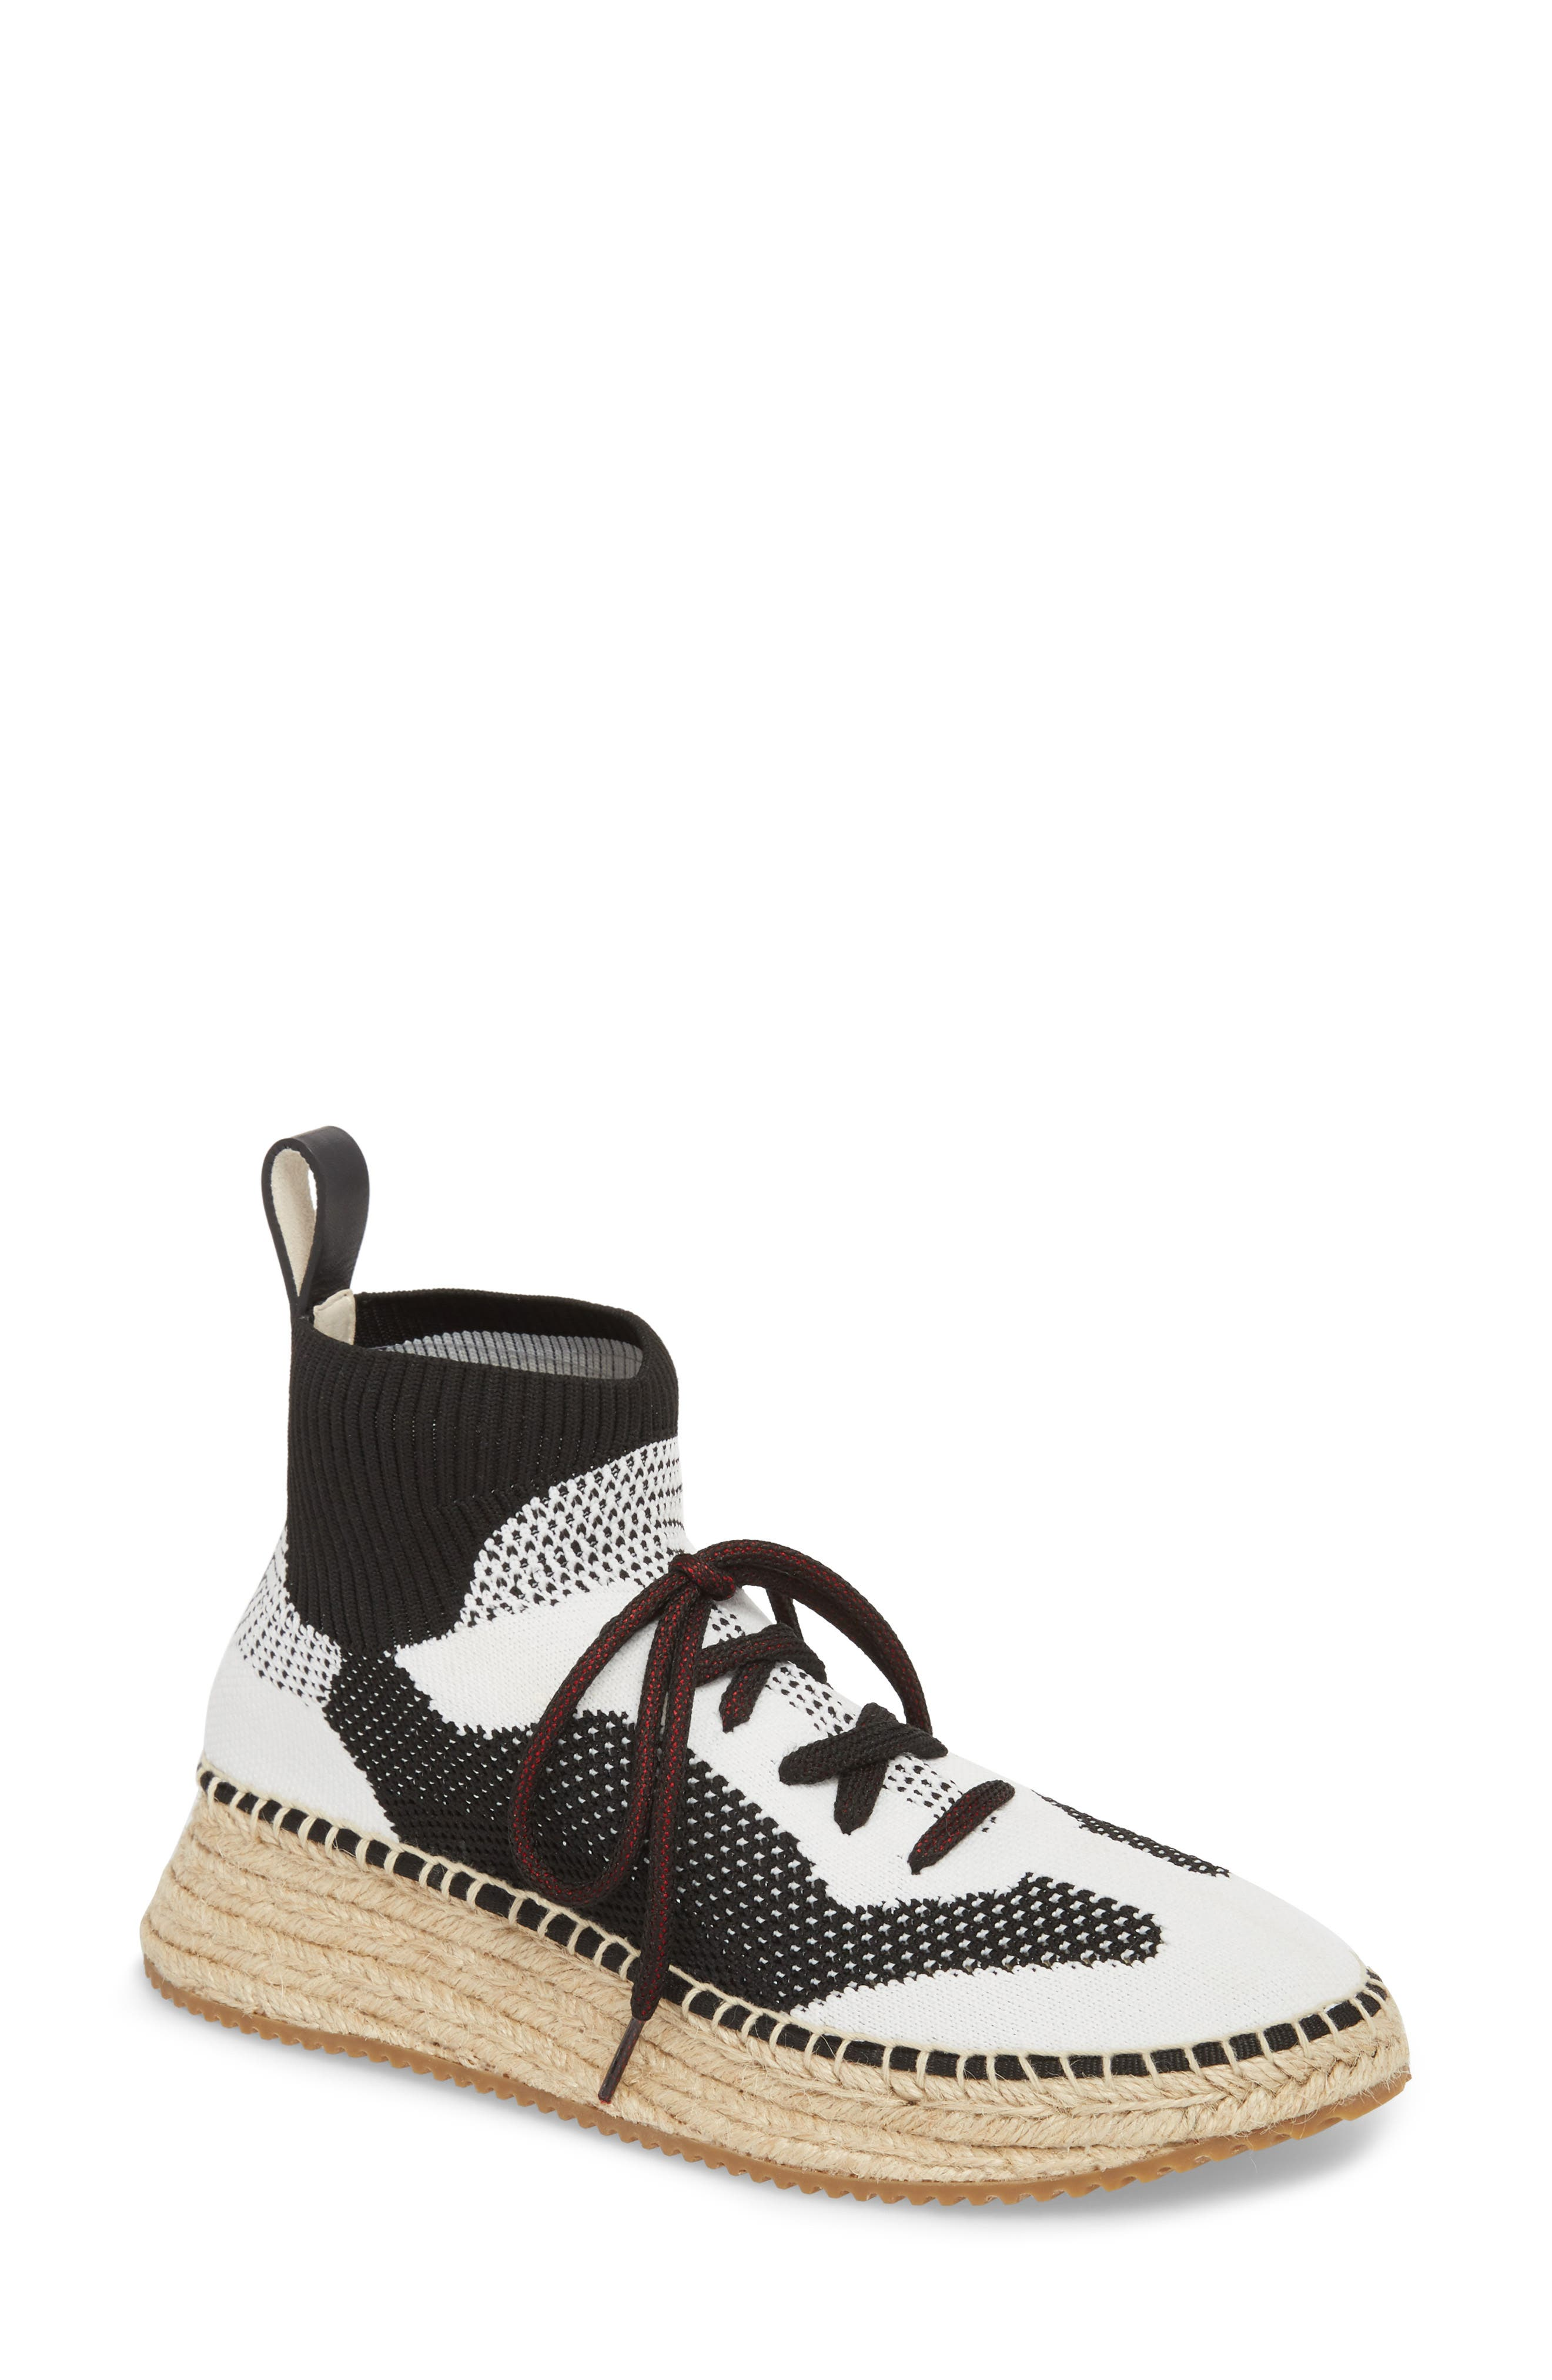 Dakota Espadrille Sock Sneaker,                         Main,                         color, Black/ White/ Grey